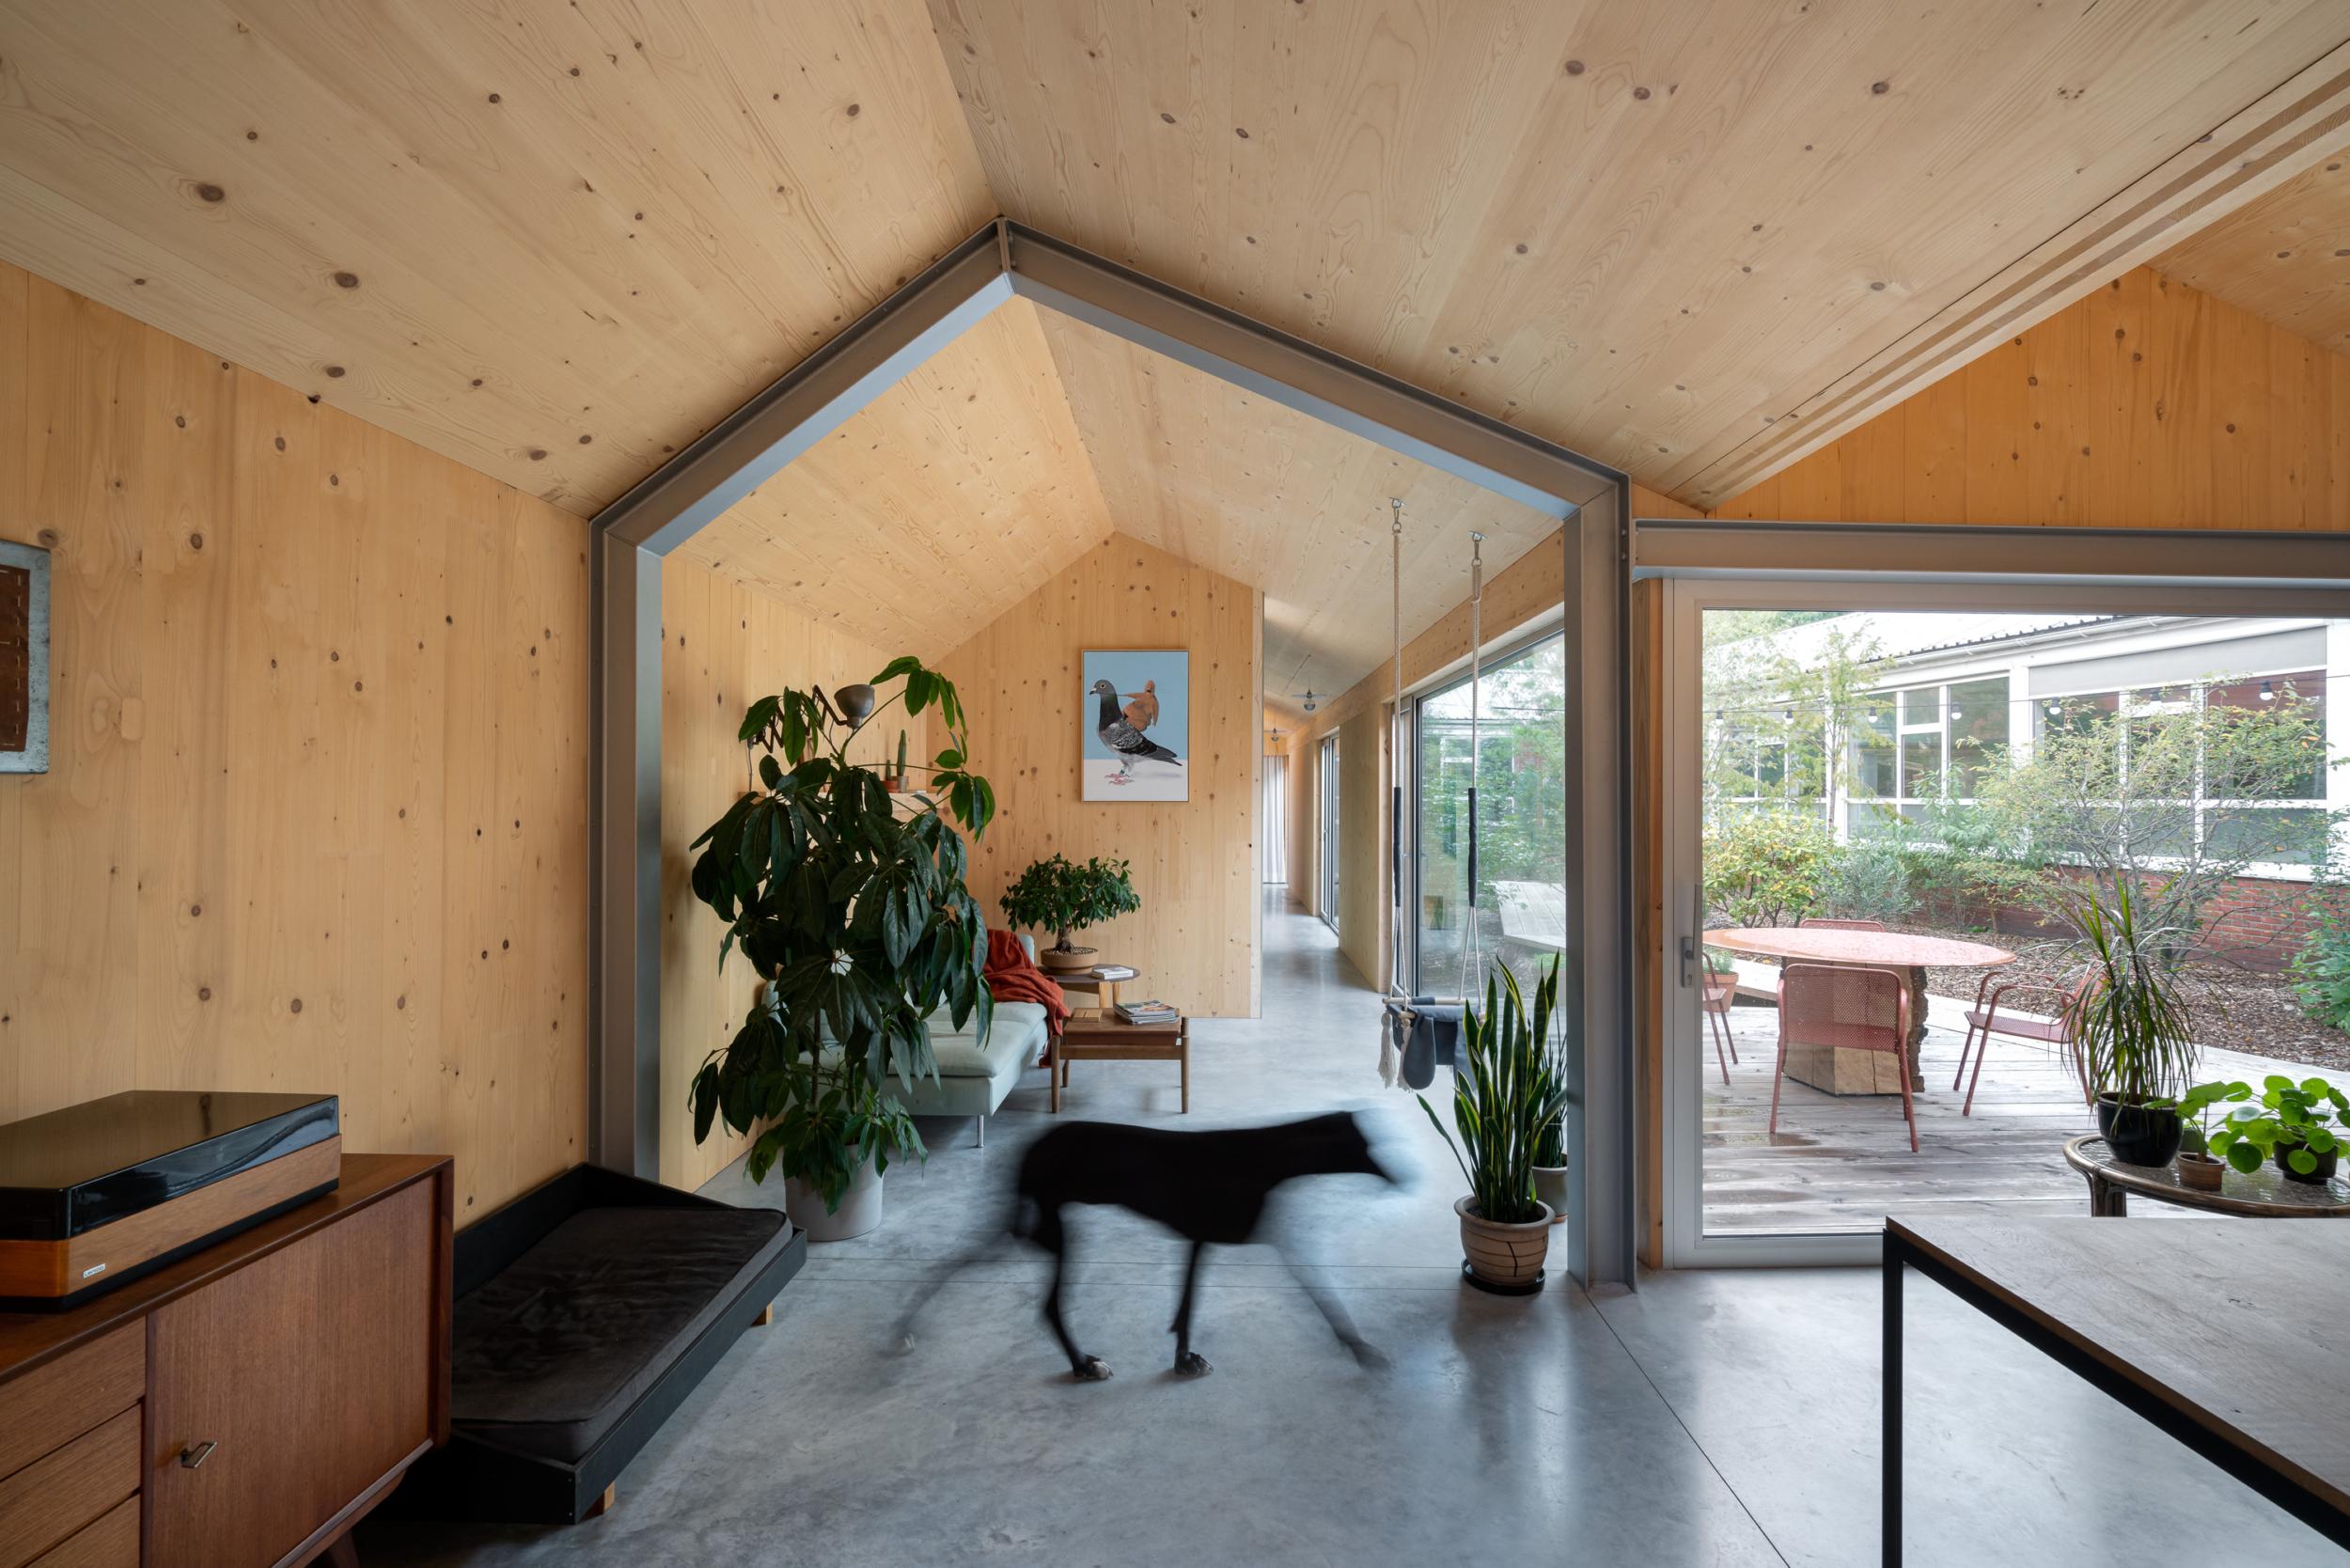 photo by Bert Vereecke of interior (Pulle) for Objekt Architecten